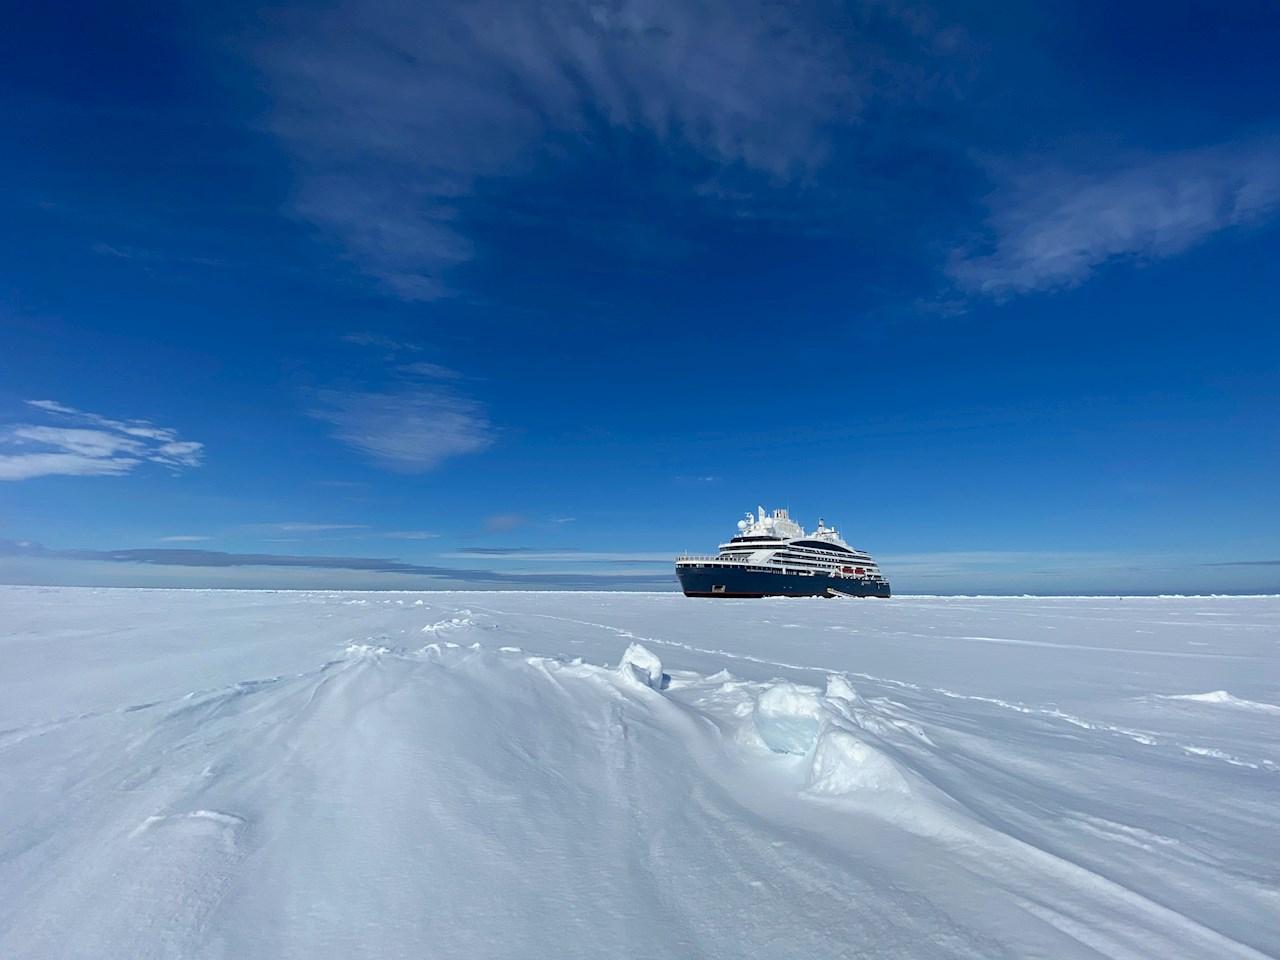 Polarkryssaren Le Commandant Charcot påväg genom isen (©PONANT-Nicolas Dubreuil).